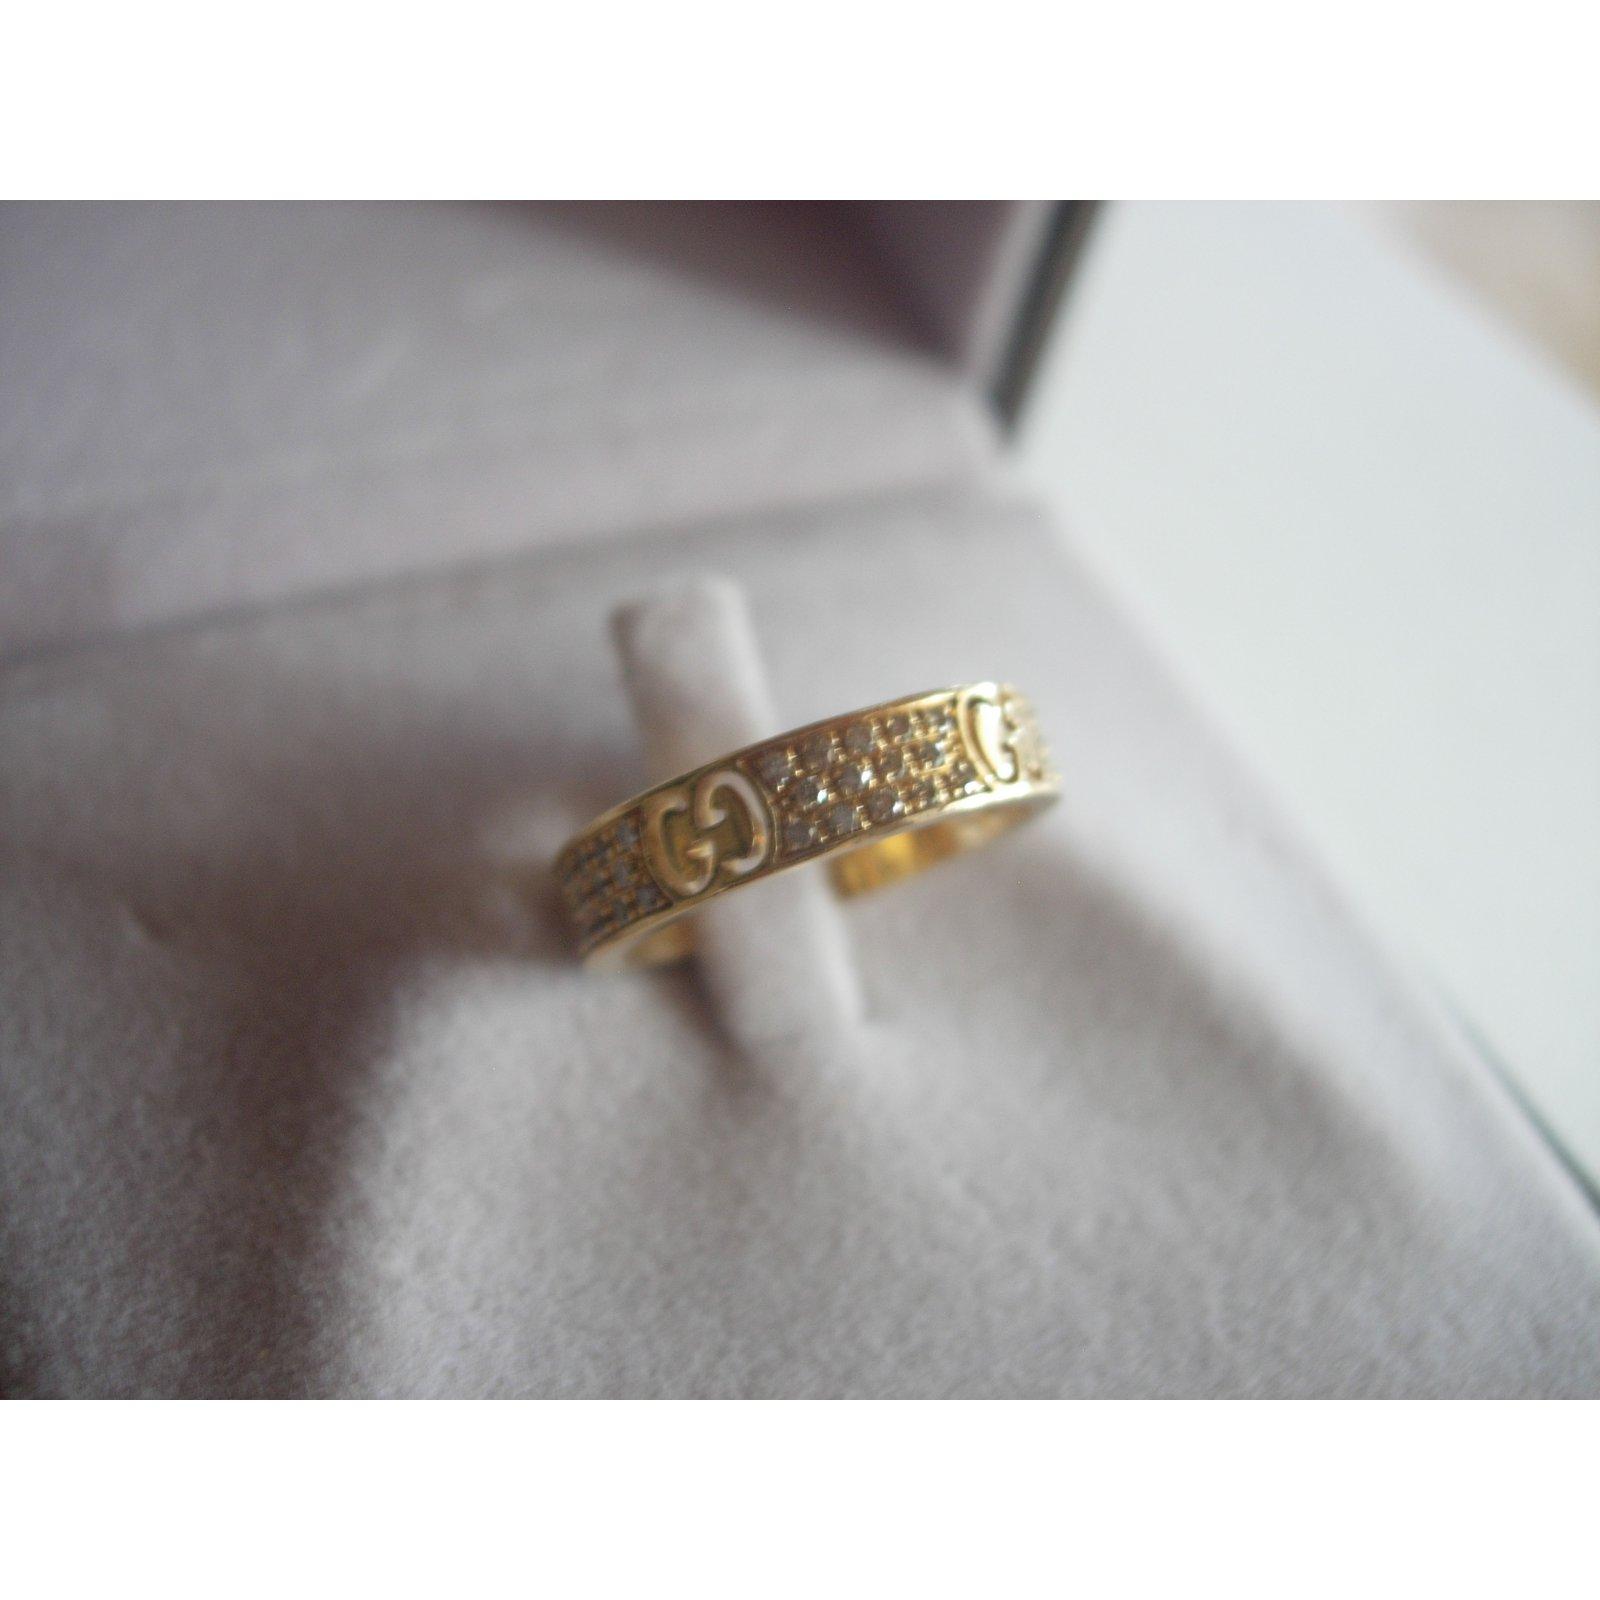 071bb4752bcac0 Gucci Ring Rings Yellow gold Golden ref.29530 - Joli Closet